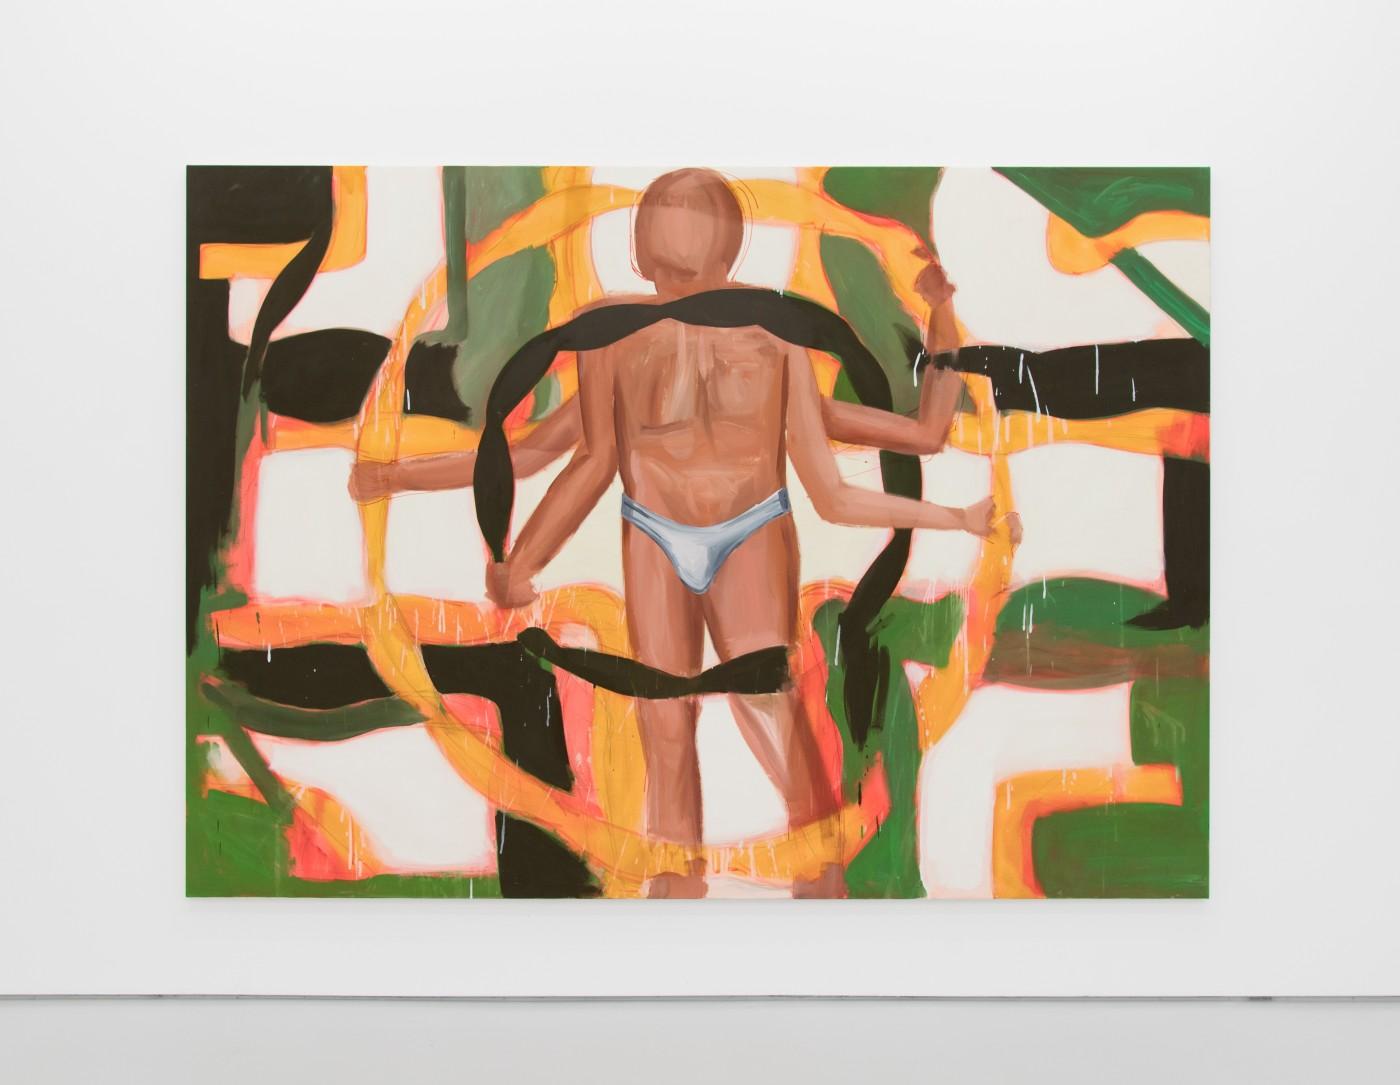 TOM HUMPHREYS  End of Man</I>, 2018 Acrylic on canvas 200 × 280 cm / 78.7 × 110.2 in